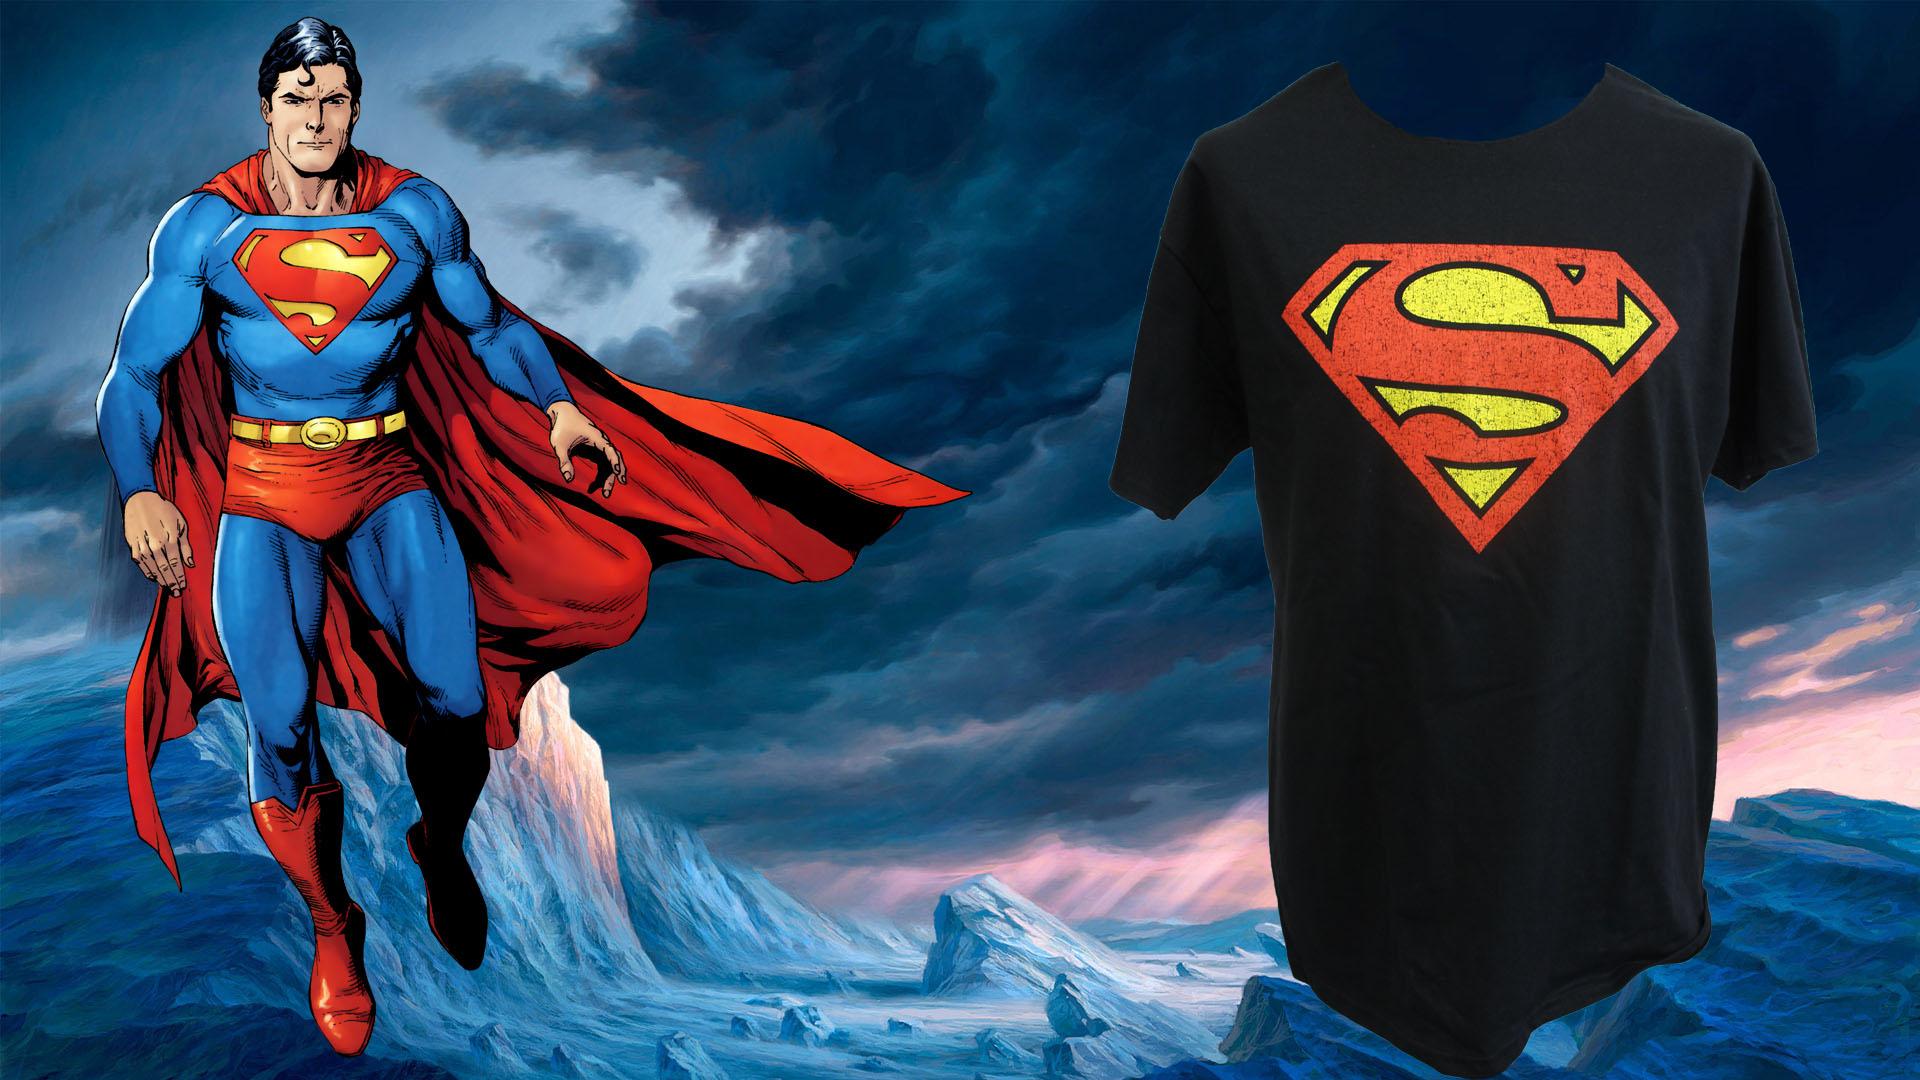 Superman | Fresh Air Ltd - Garment printing & decorating services